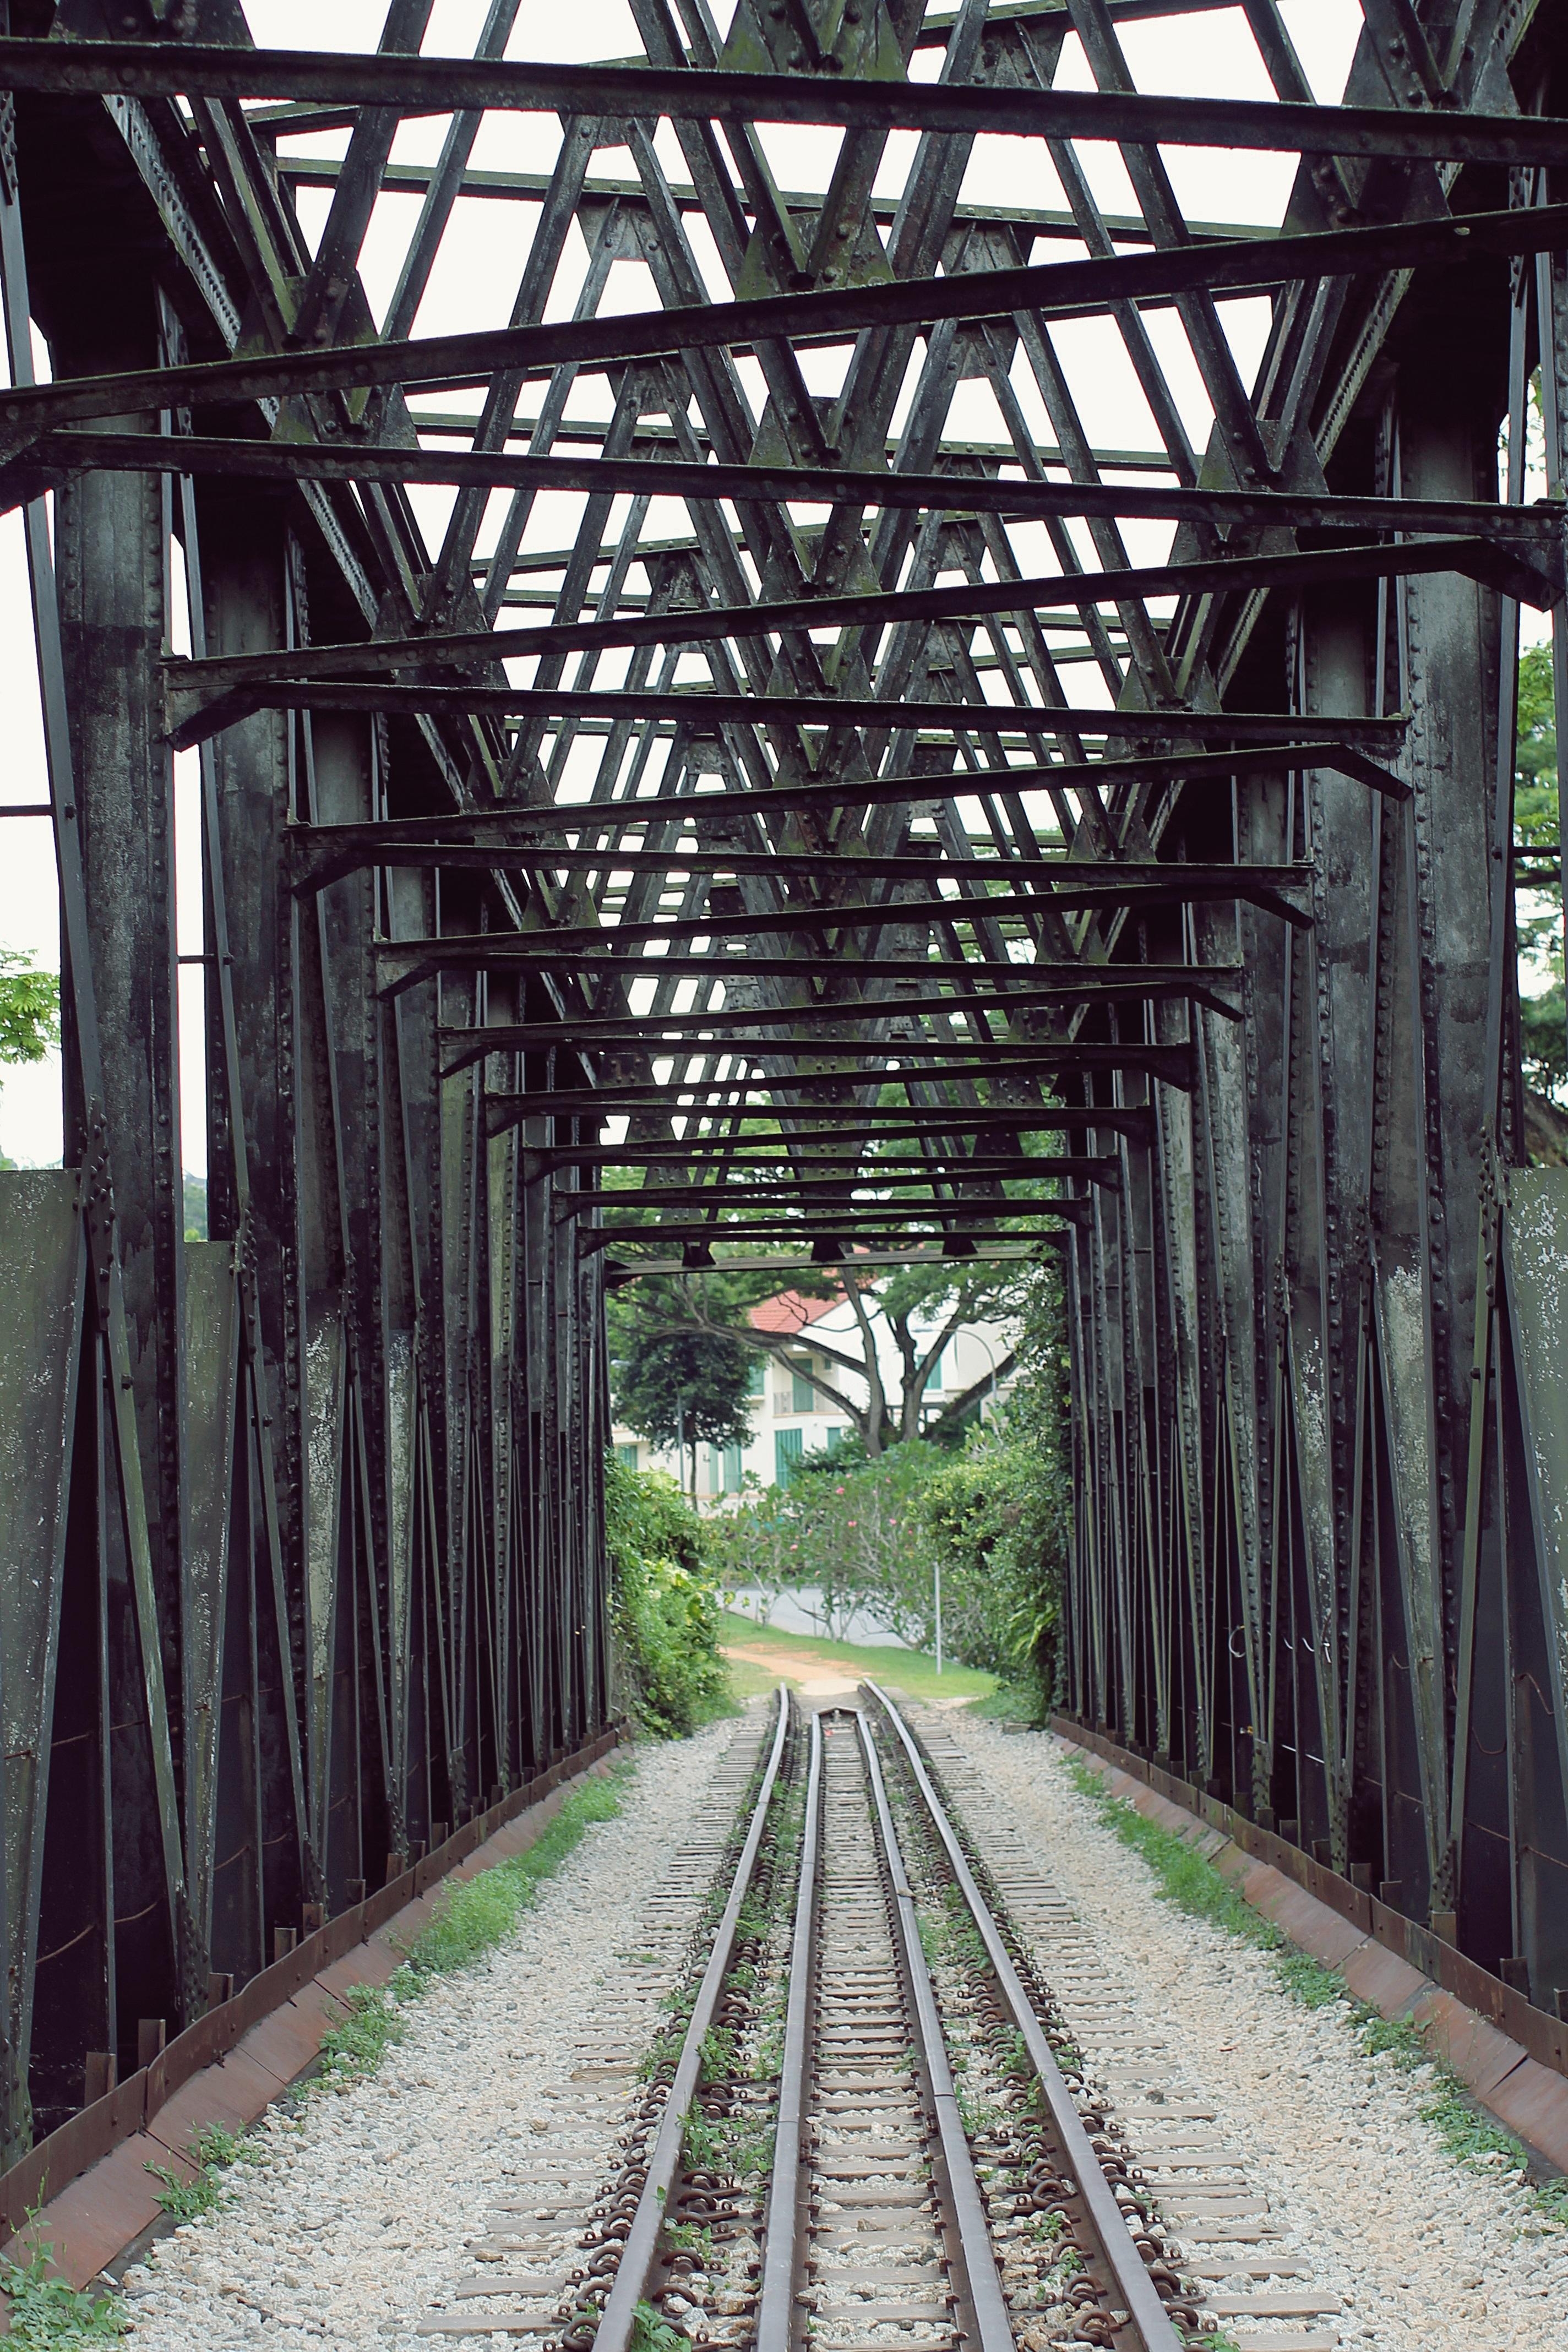 free images landscape architecture structure track railway